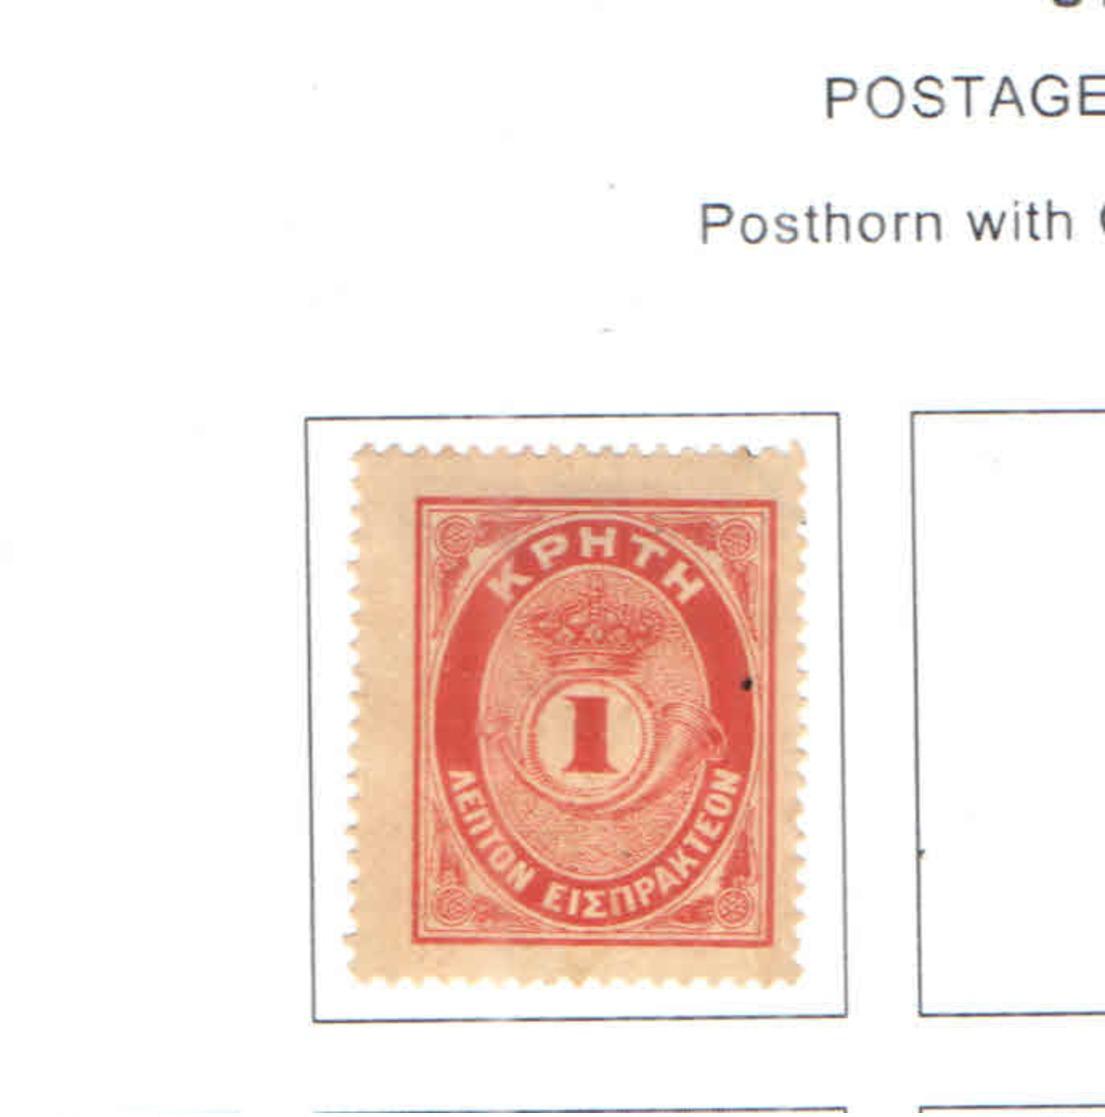 Creta Postage 1901 Posthorn   Scott.J 01 See Scan On Scott.Page - Creta